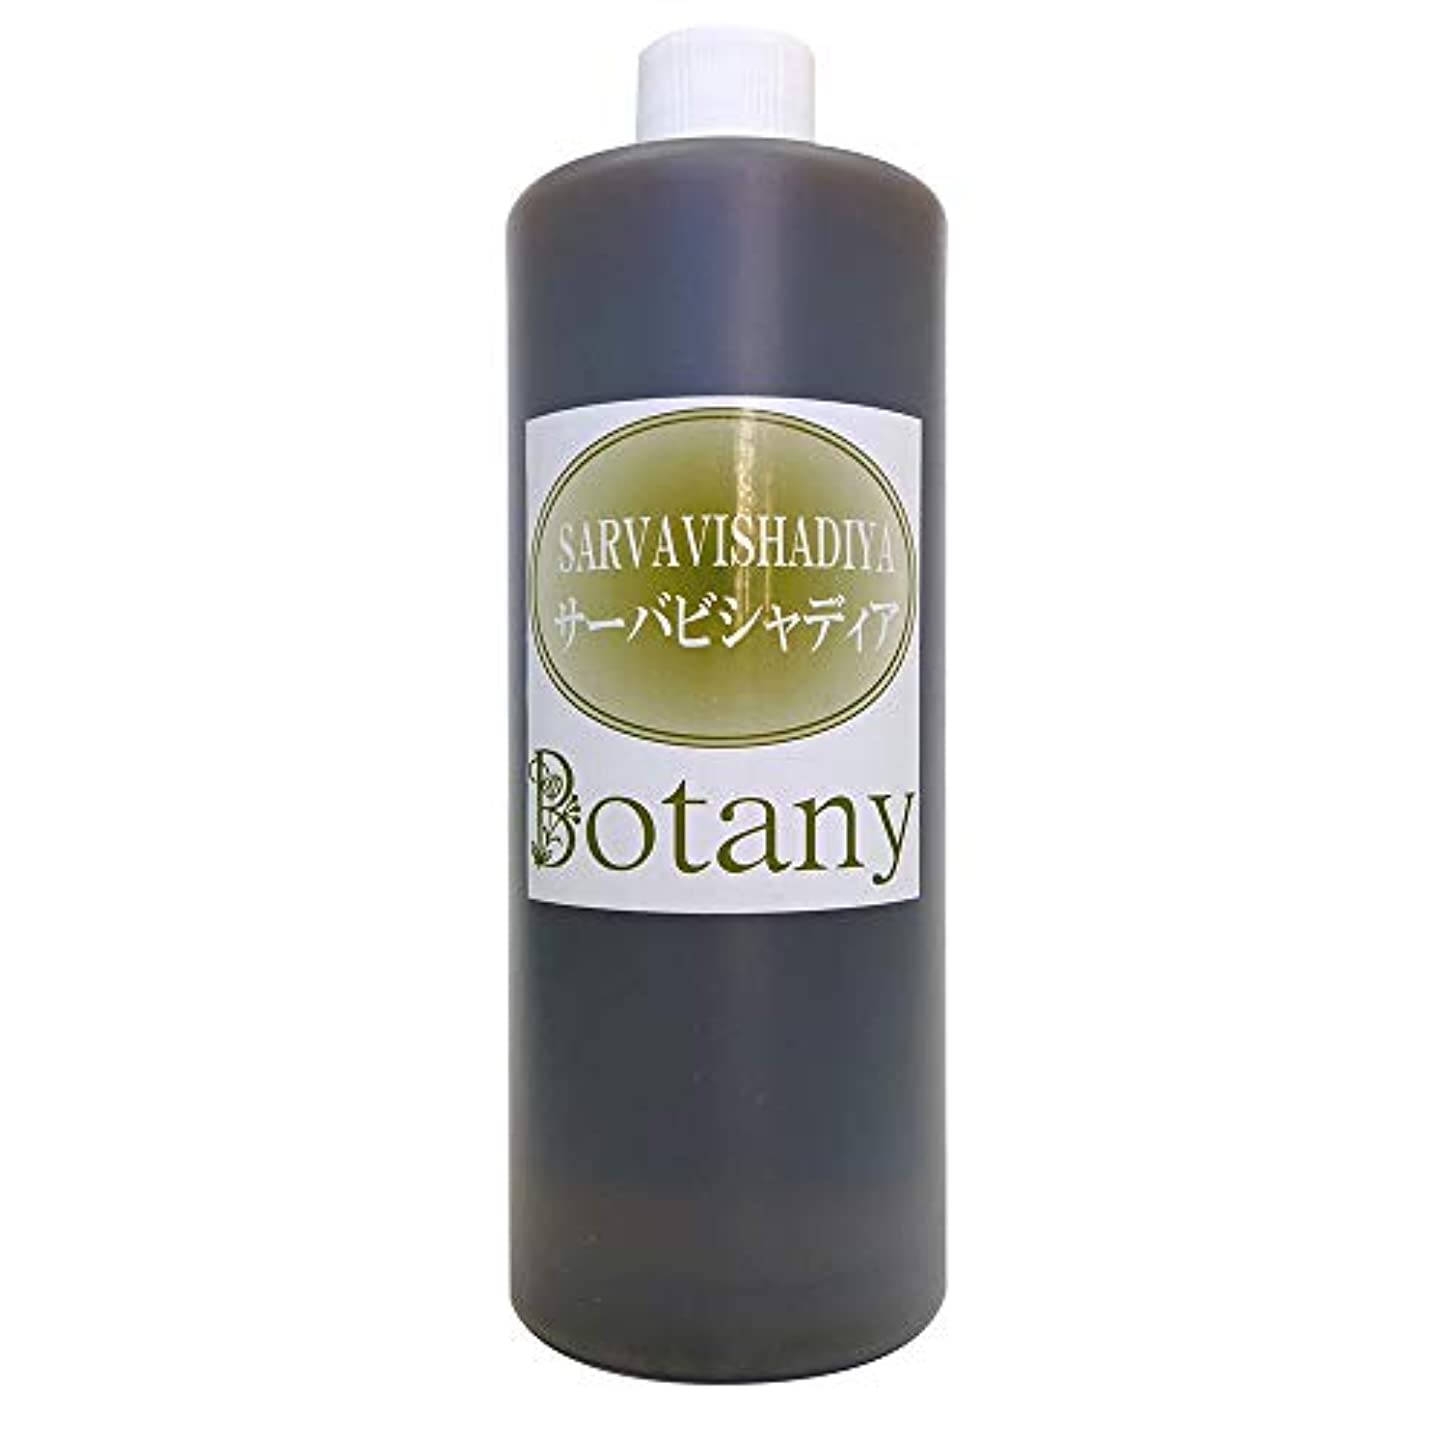 Botanyオイル サーバビシャディヤ ボディ用 エステ サロン マッサージオイル 500ml